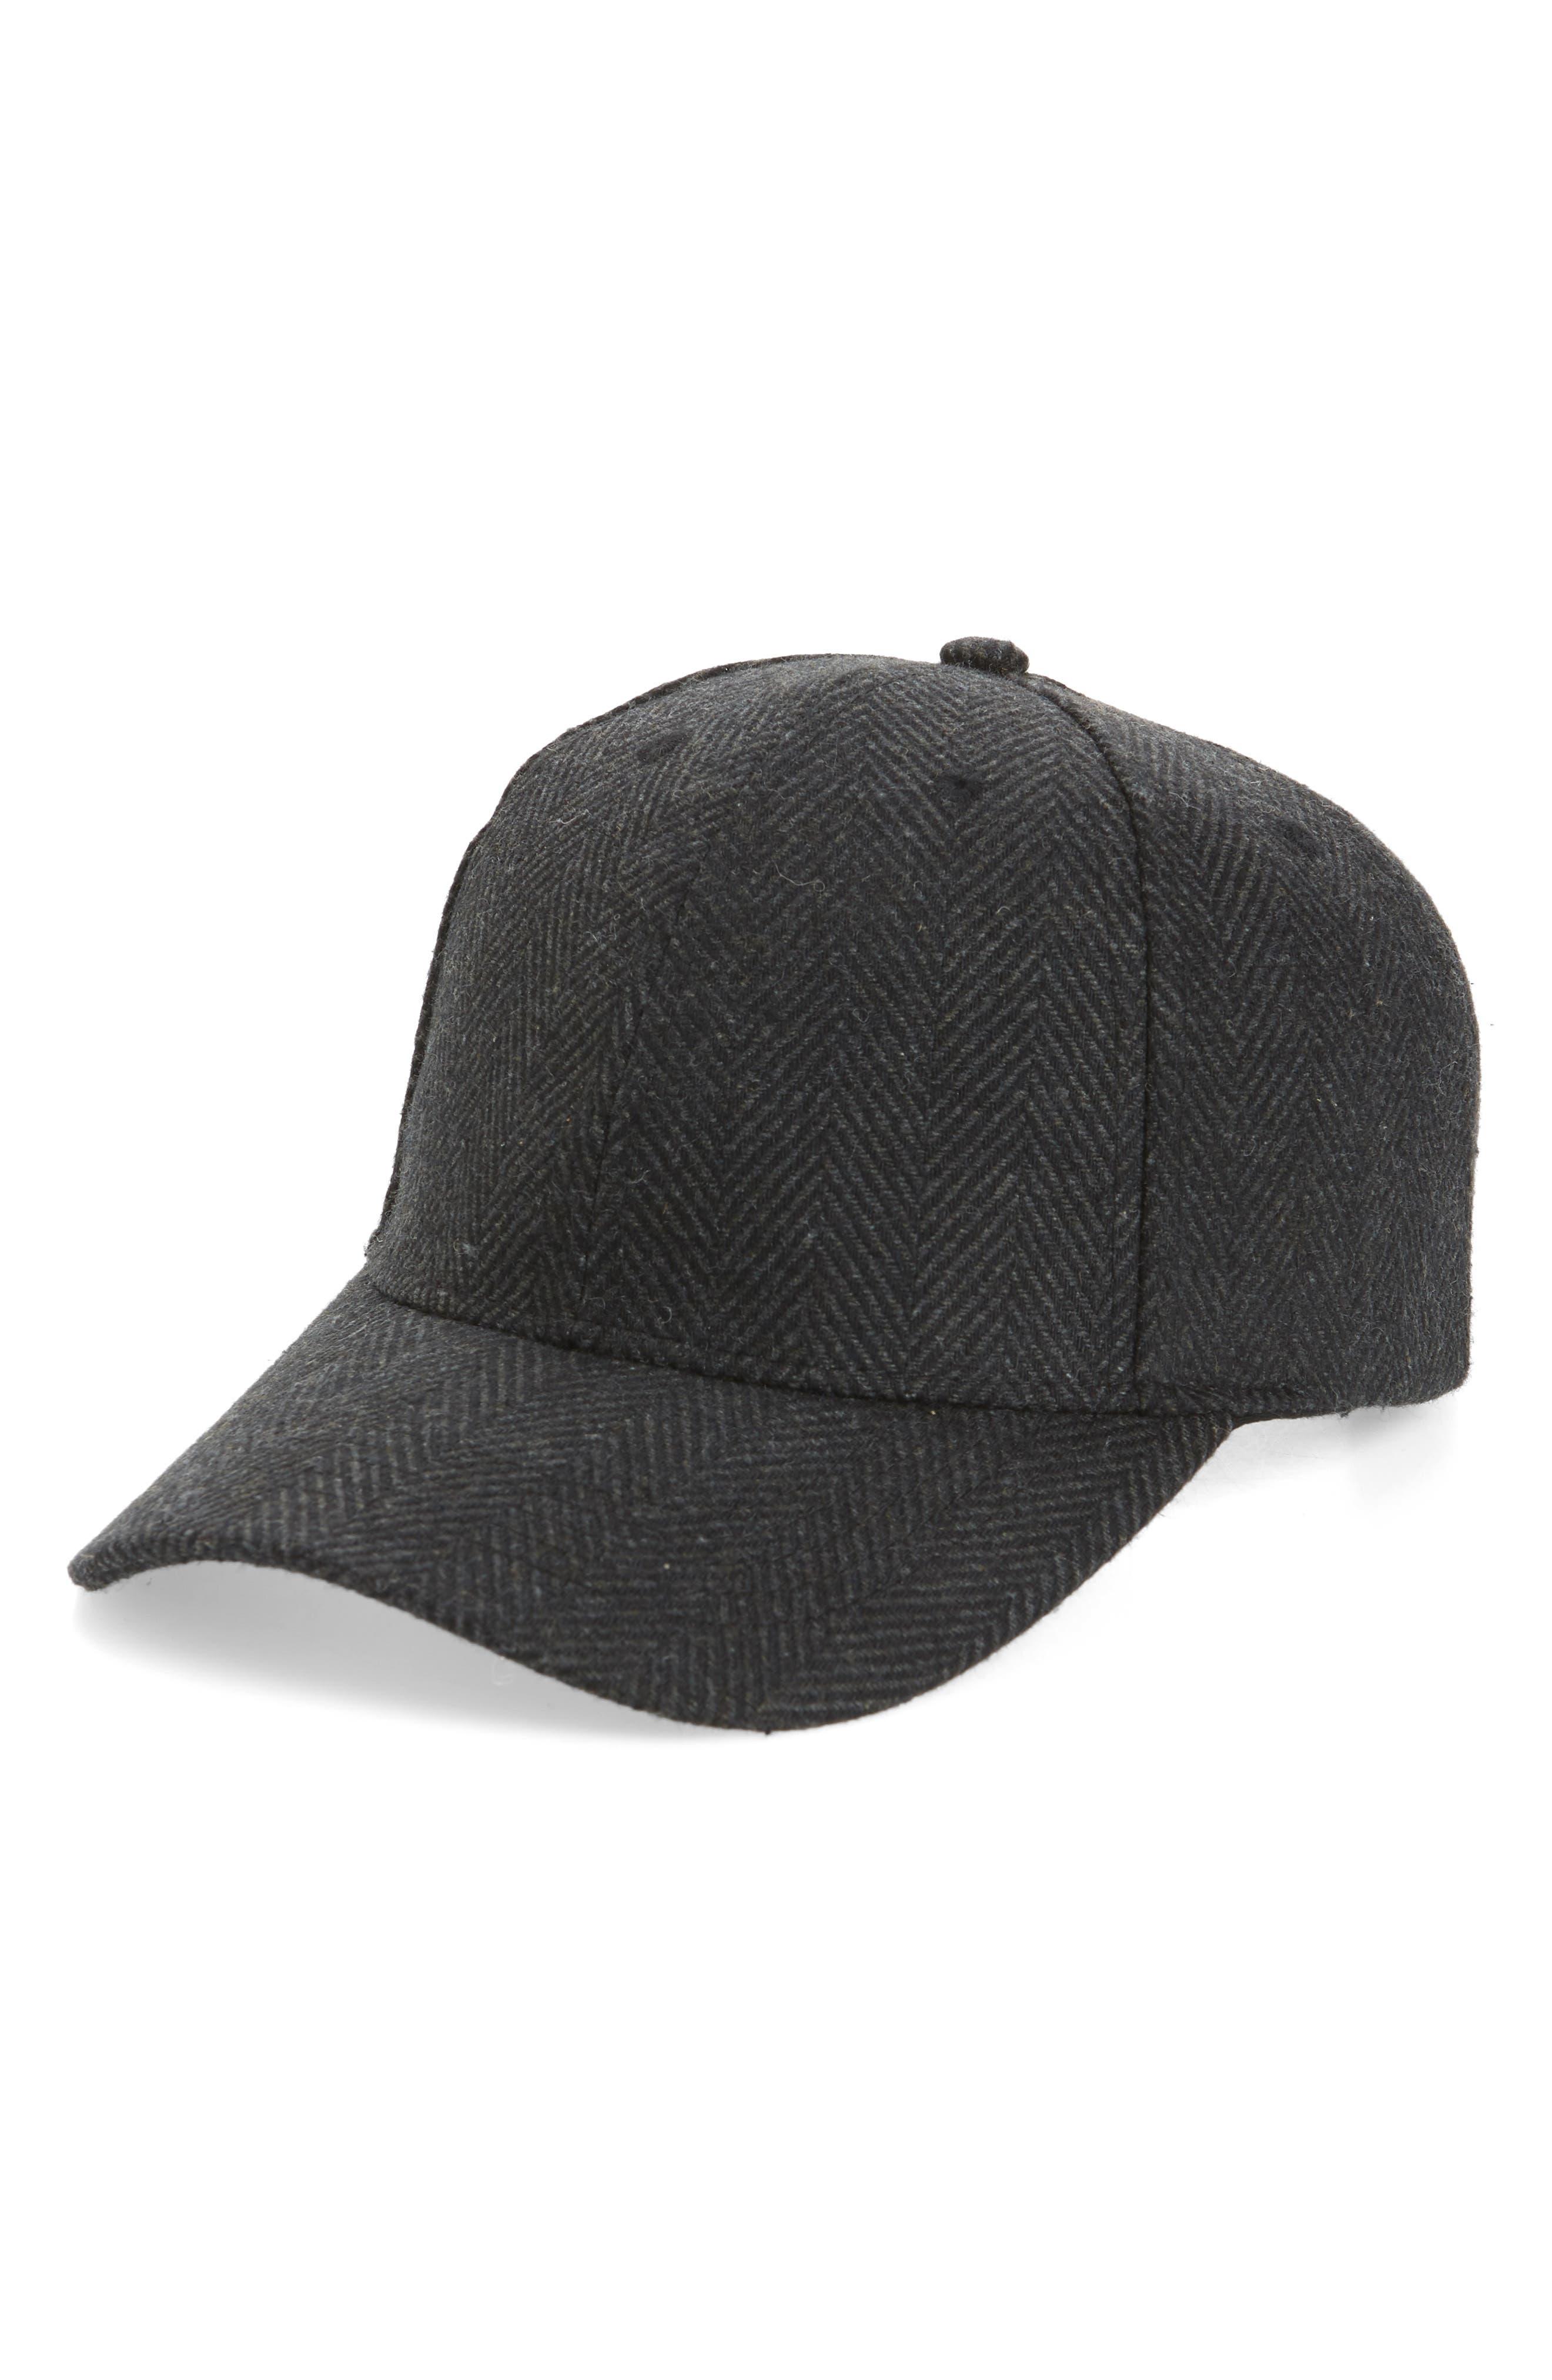 NORDSTROM MEN'S SHOP Herringbone Ball Cap, Main, color, 001